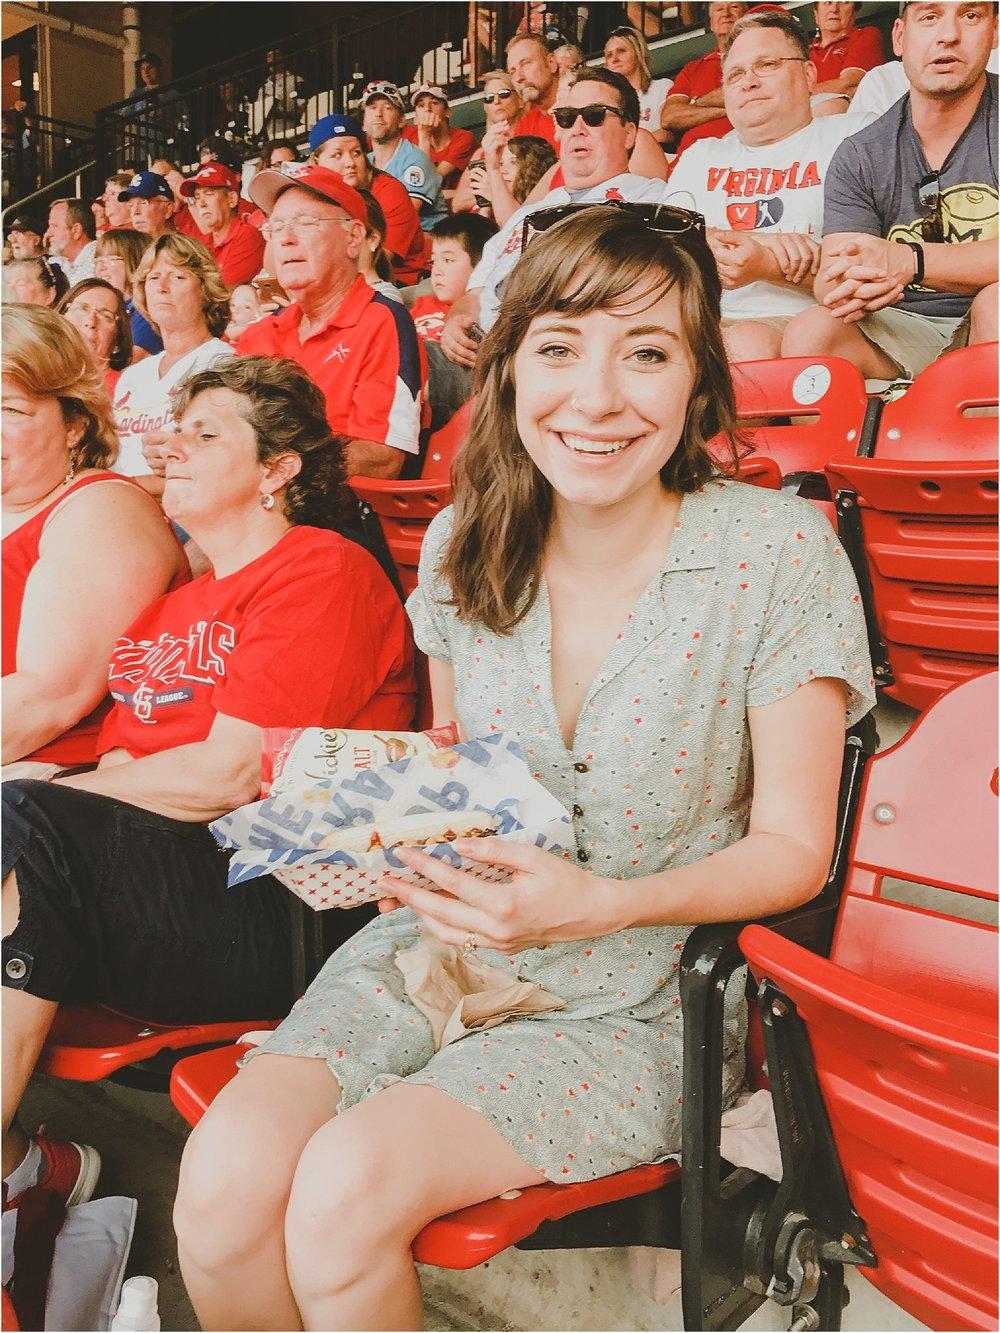 PattengalePhotography_WeekendWear_BucketList_KC_KansasCityRoyals_Baseball_BuschStadium_StLouis_Missouri_0004.jpg